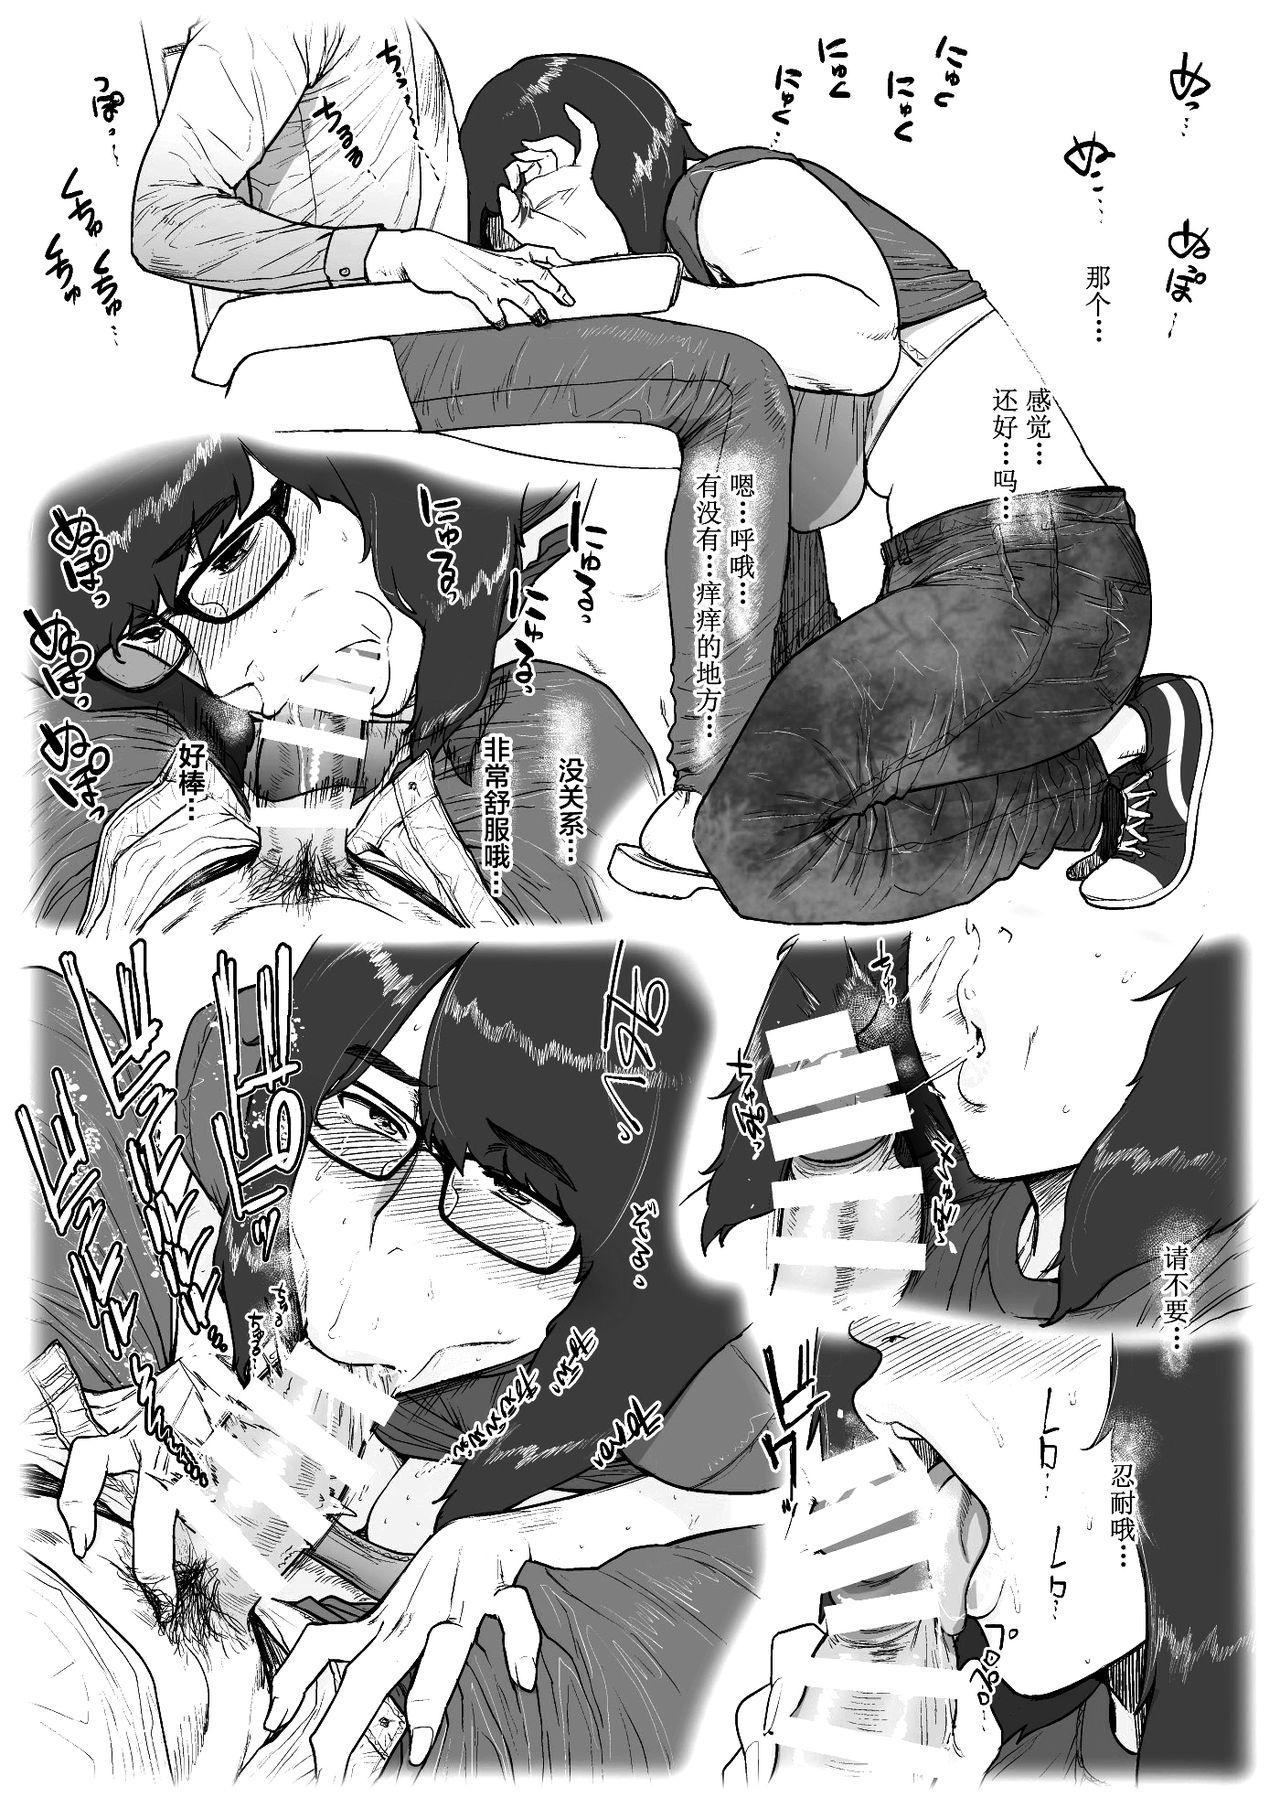 1000 Yen Cut no Onee-san ni Suite Morau Hon. II 5